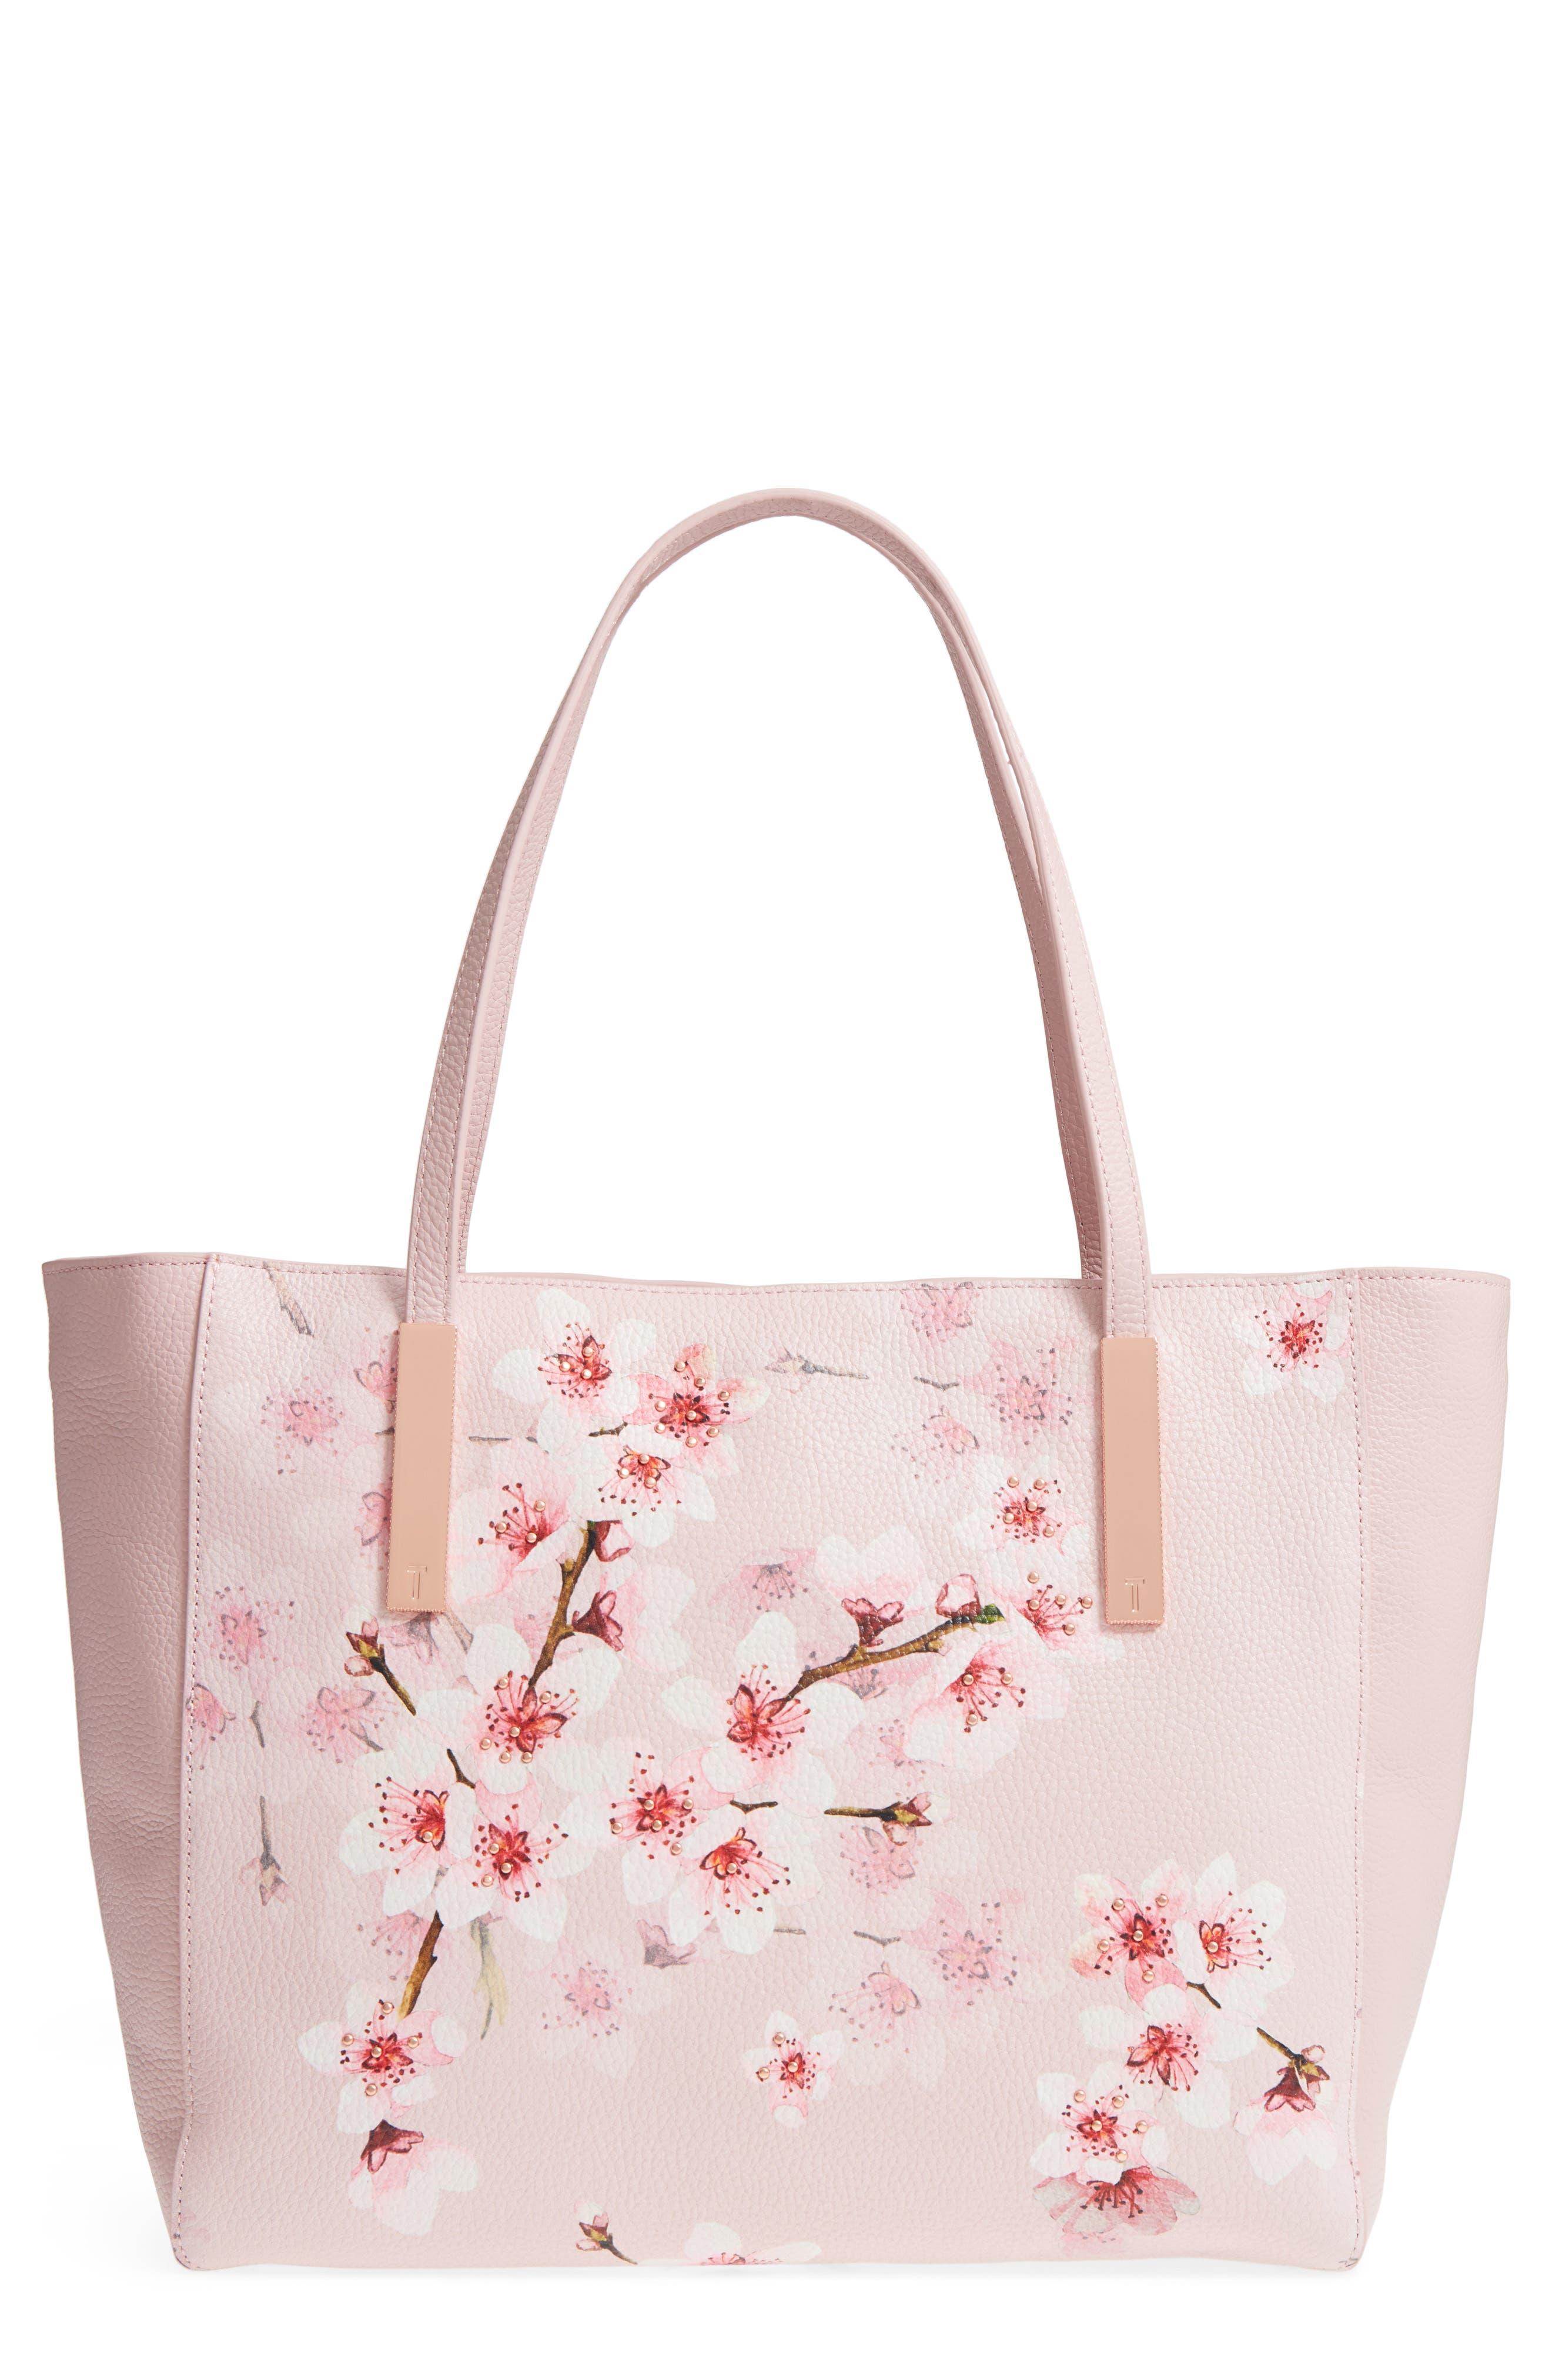 Soft Blossom Leather Shopper,                         Main,                         color,